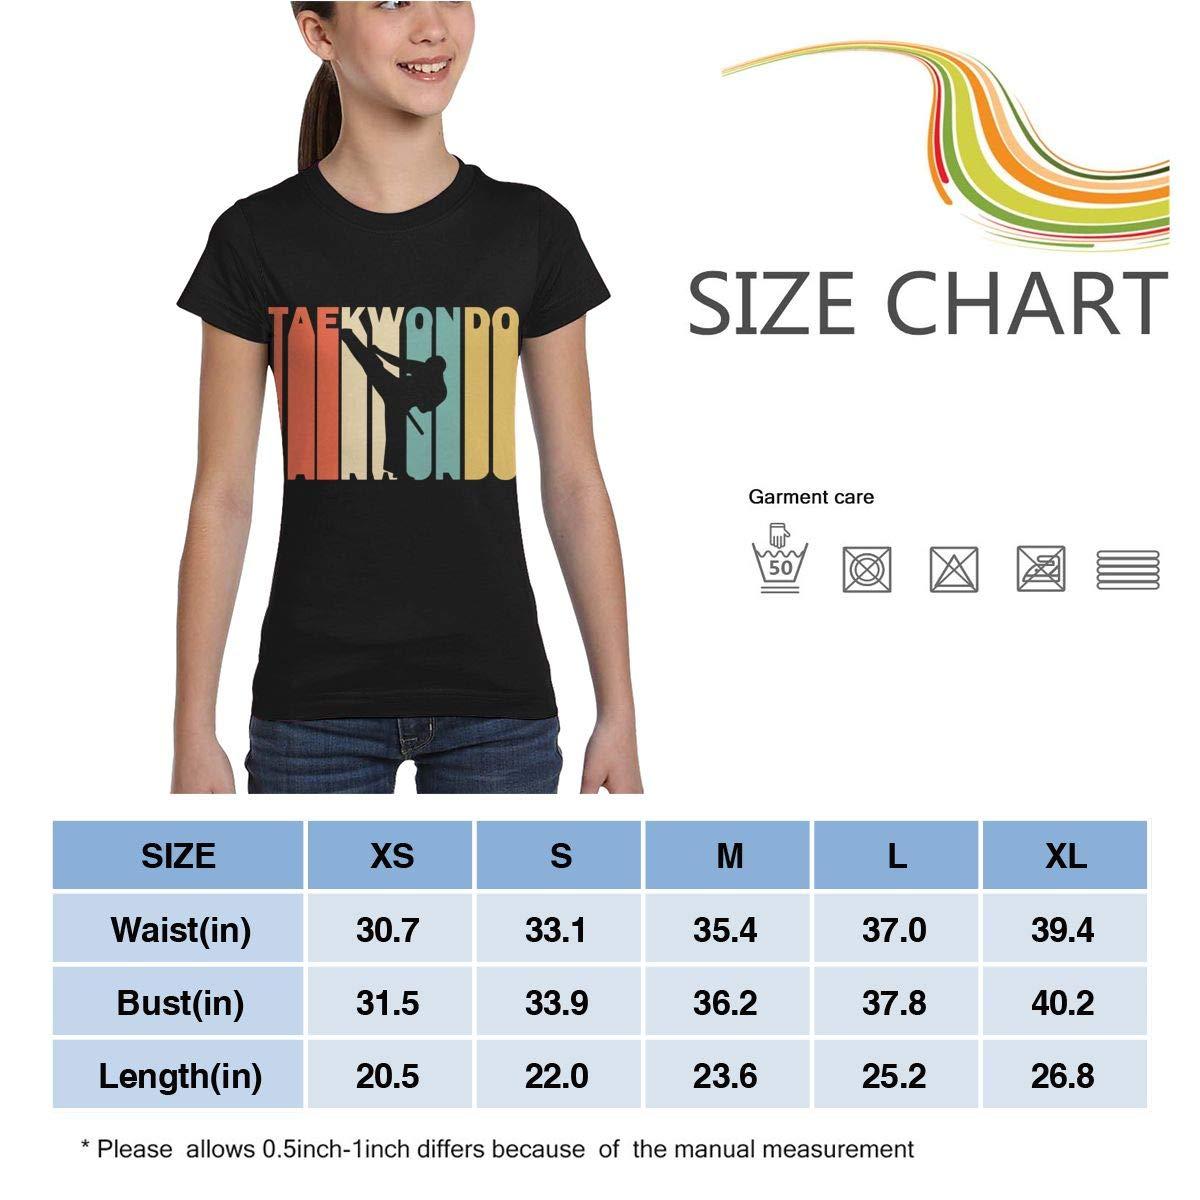 Casual Blouse Clothes XS-XL Girls Short Sleeve Retro Style Taekwondo Silhouette T-Shirts